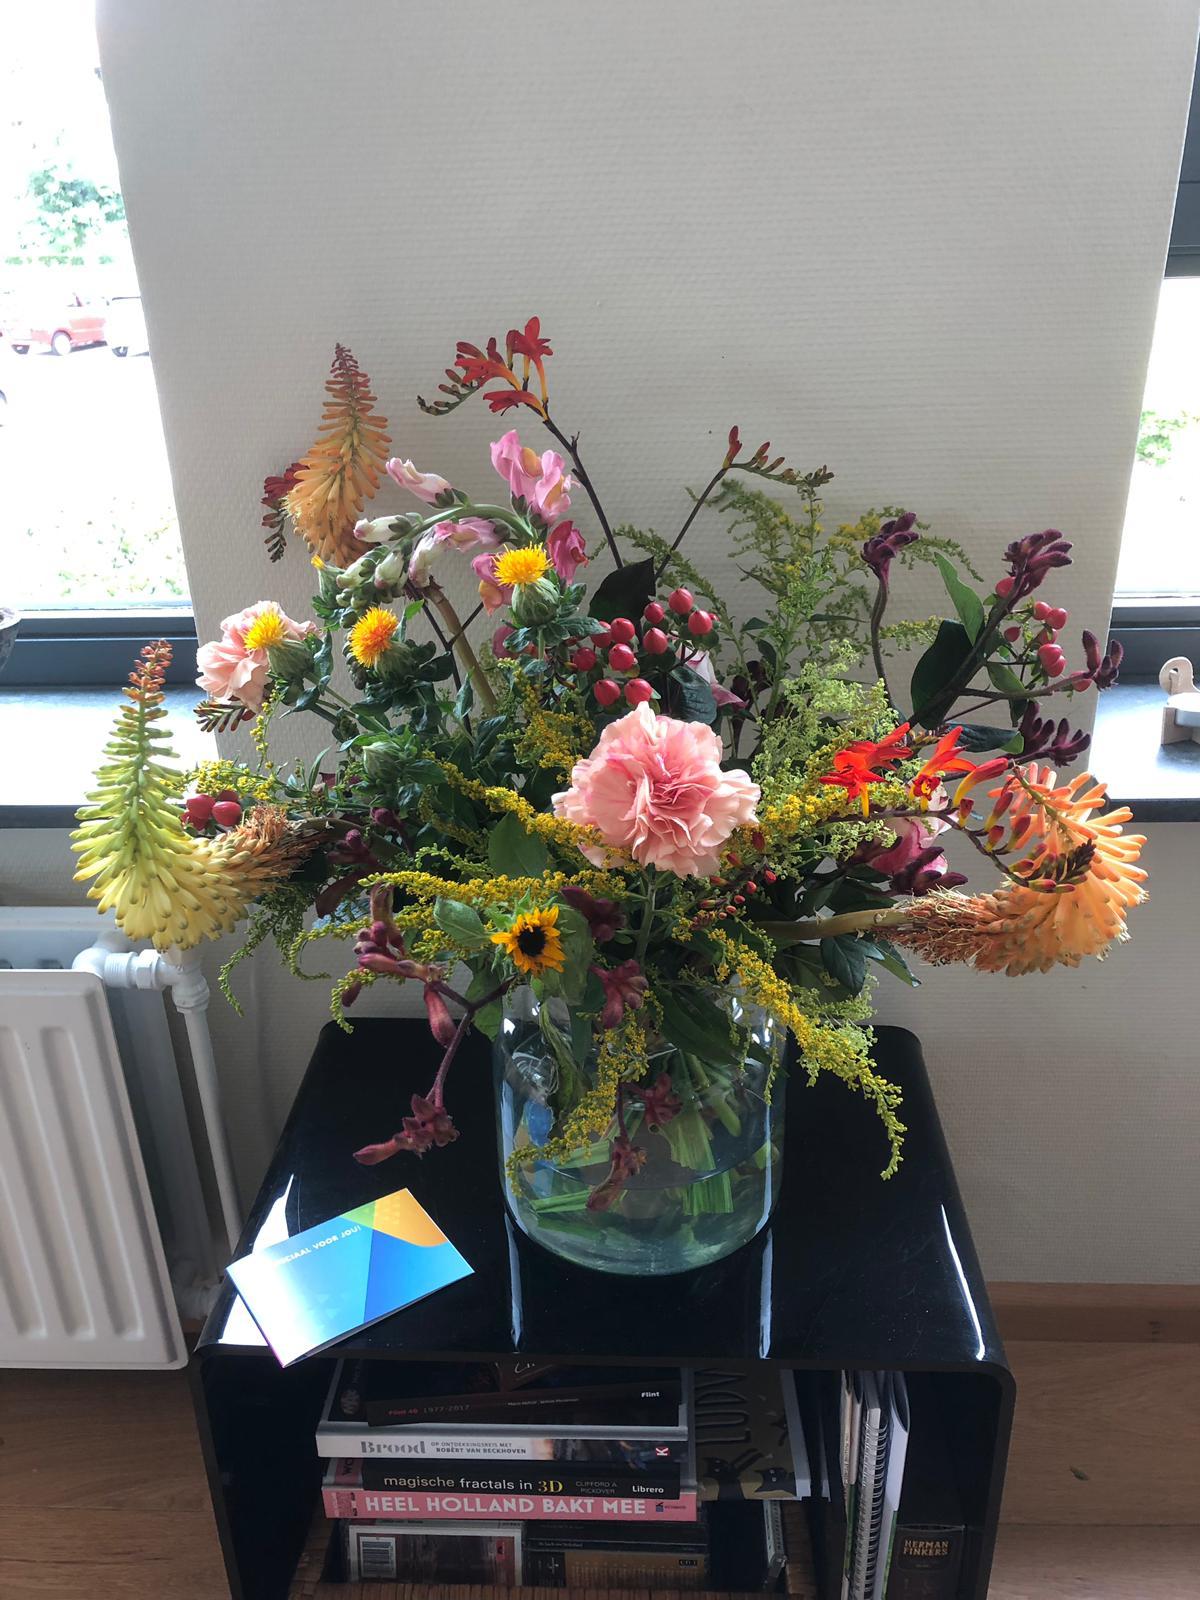 2019-07-15 Paul bloemen.jpg